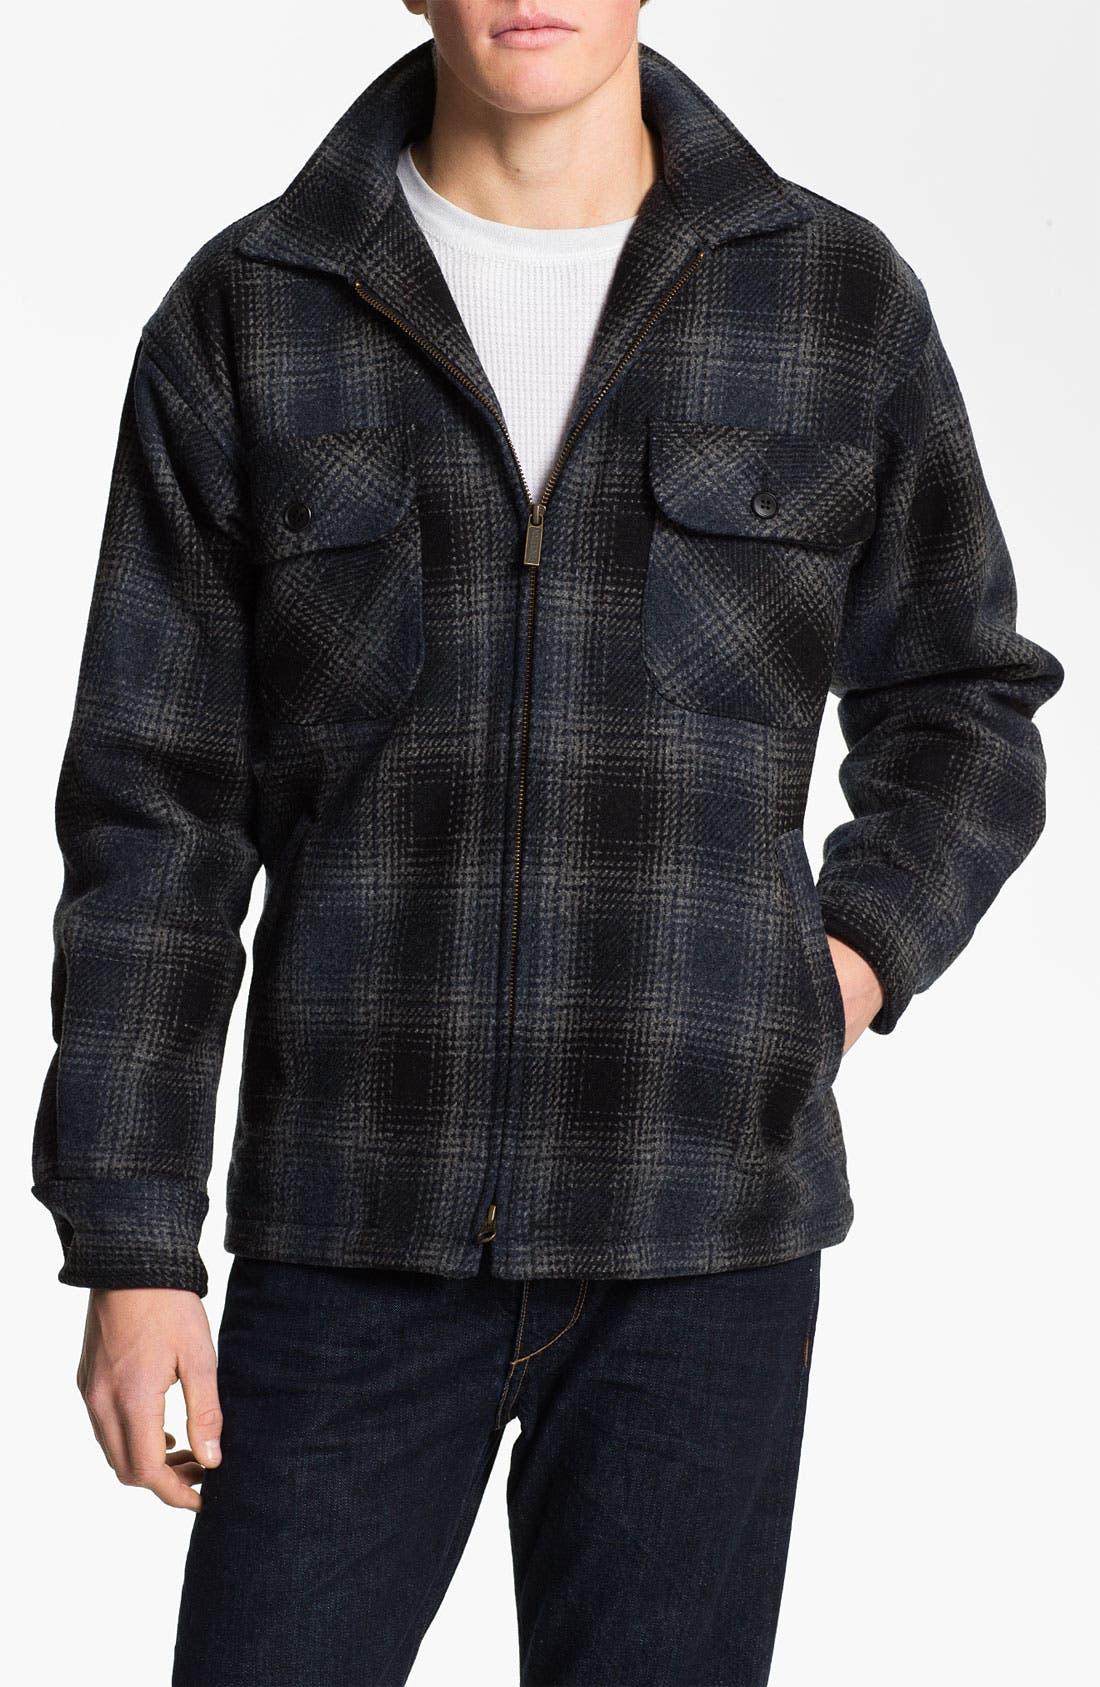 Alternate Image 1 Selected - Pendleton Plaid Wool Shirt Jacket